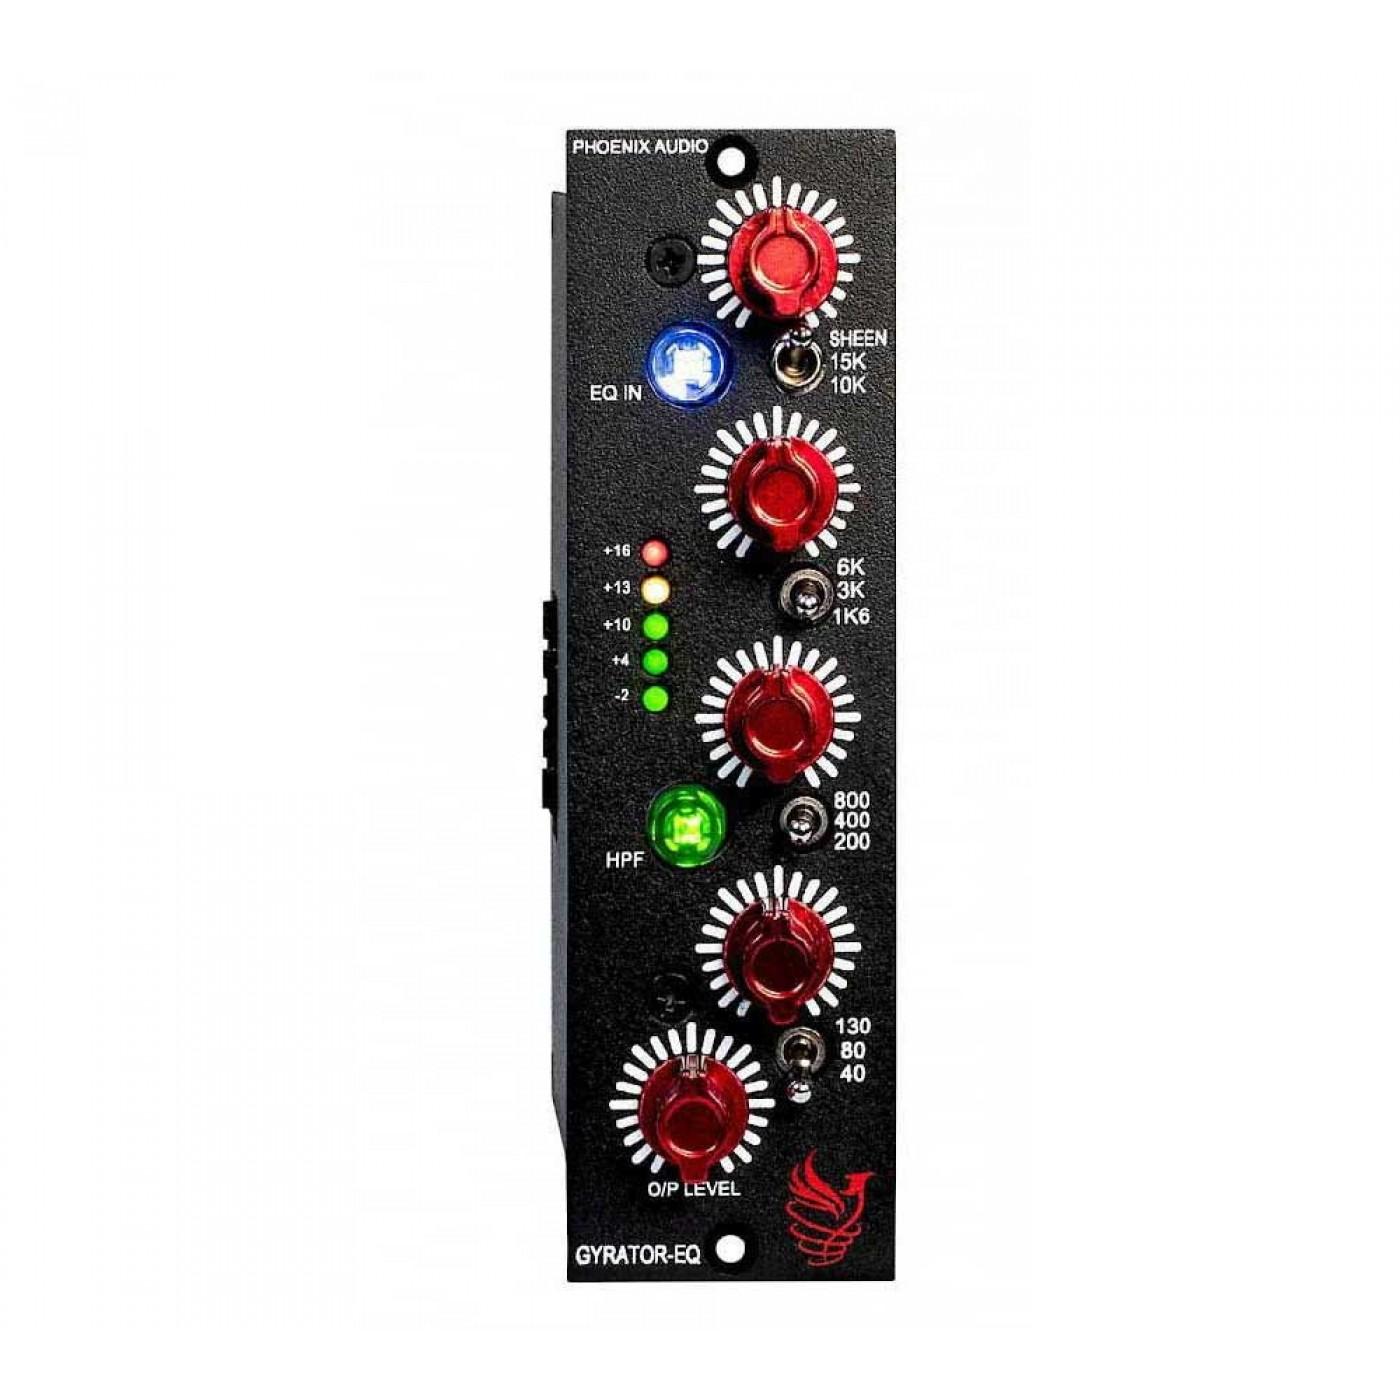 Phoenix Audio GYRATOR-EQ-500